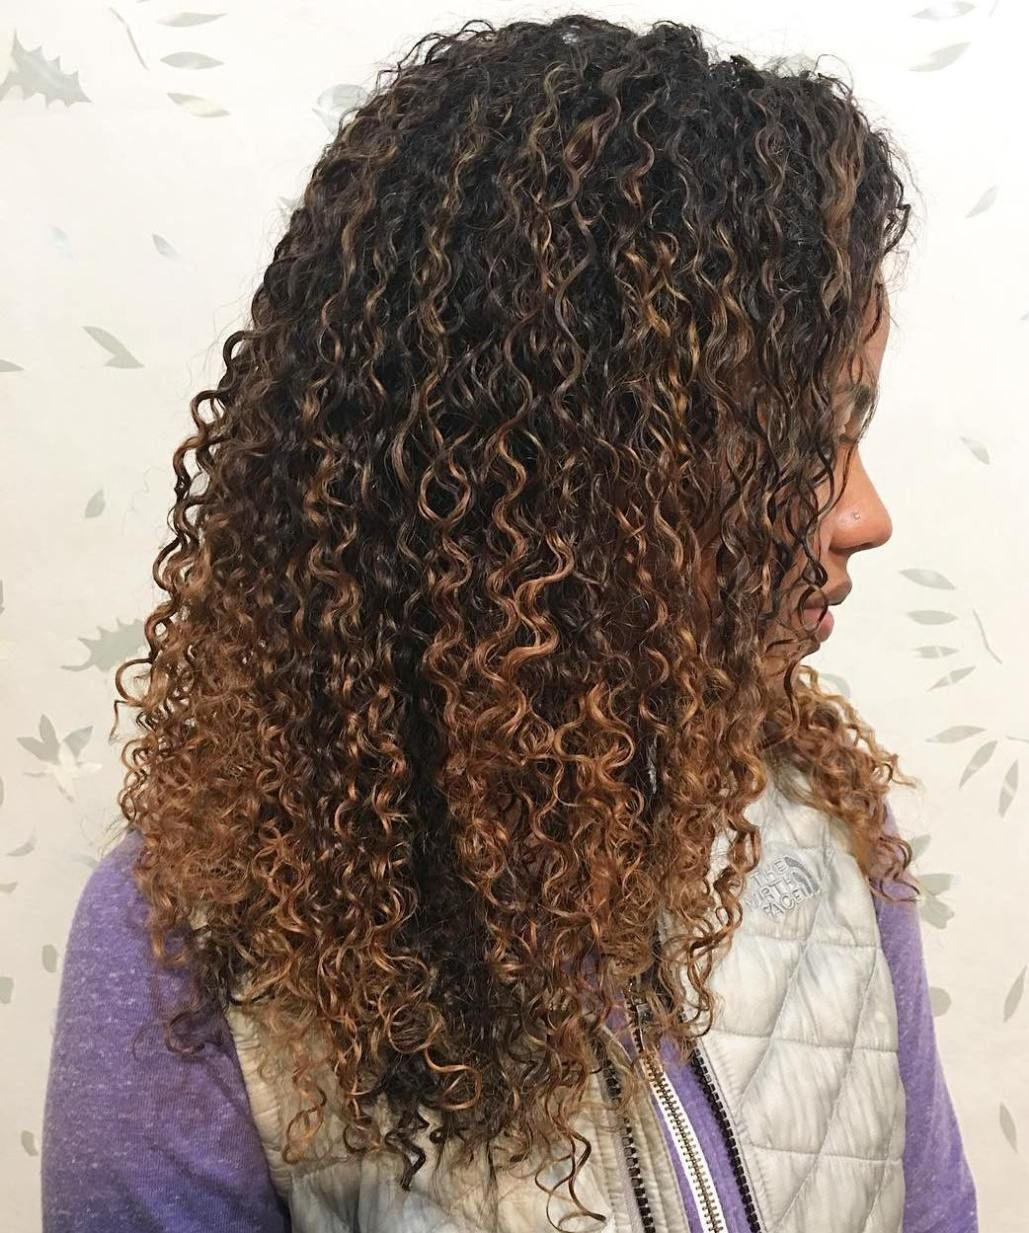 Light Brown Balayage For Natural Hair Dyed Natural Hair Light Brown Balayage Natural Hair Styles